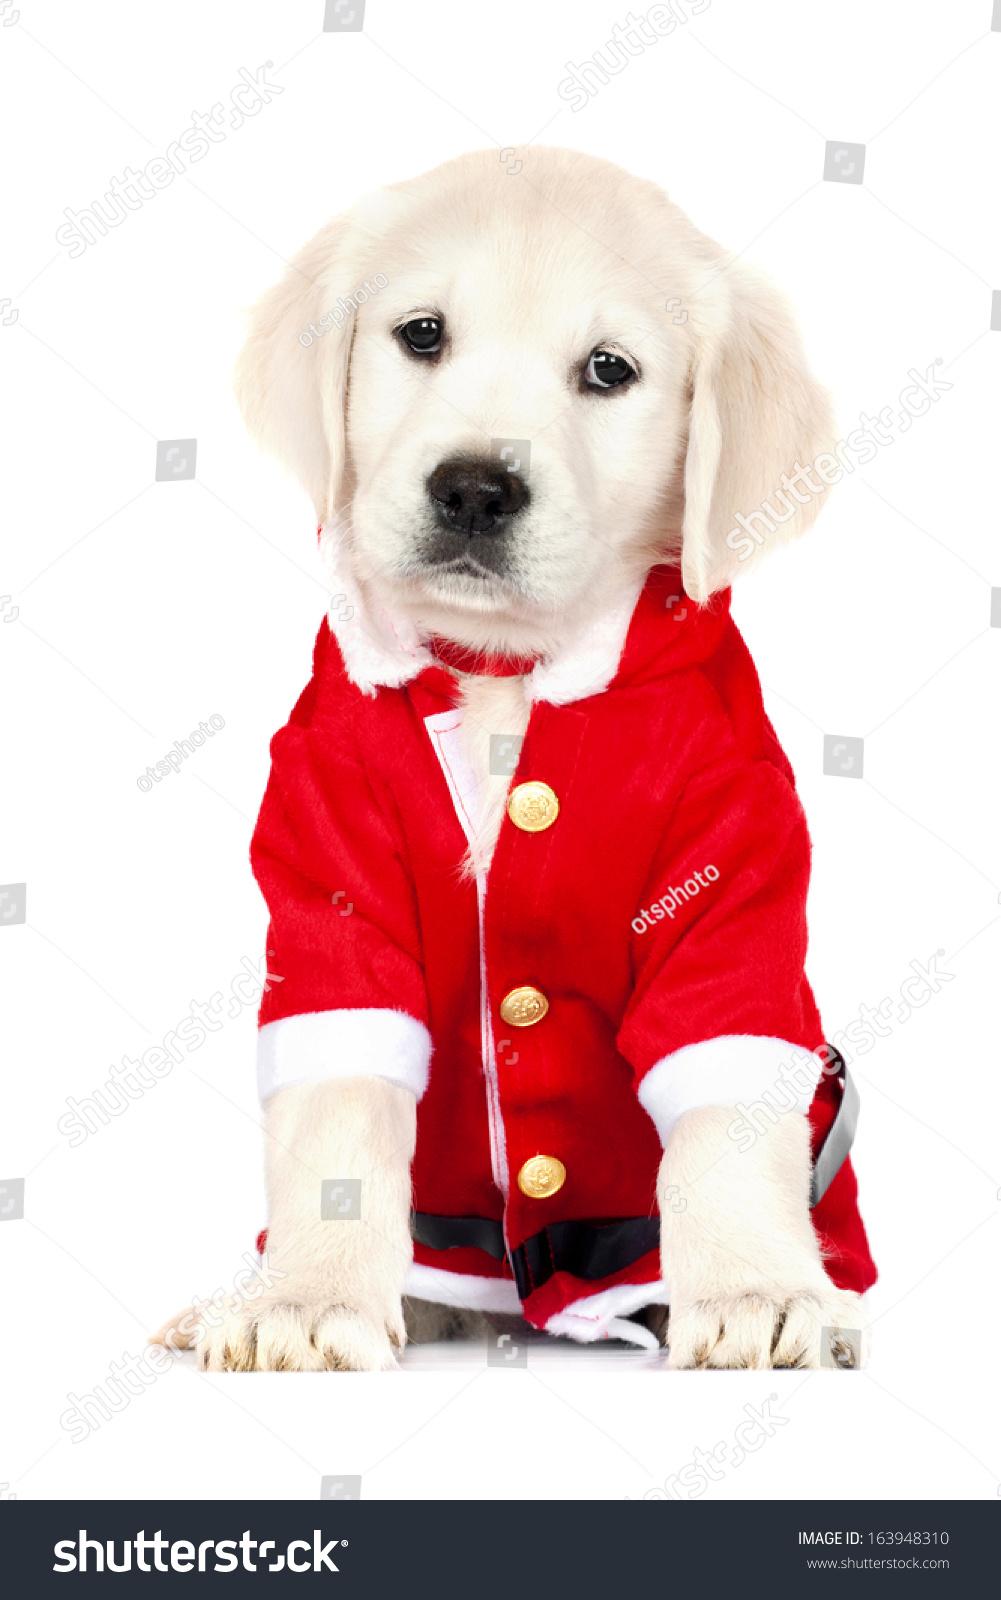 Adorable Golden Retriever Puppy Santa Costume Stock Photo Edit Now 163948310